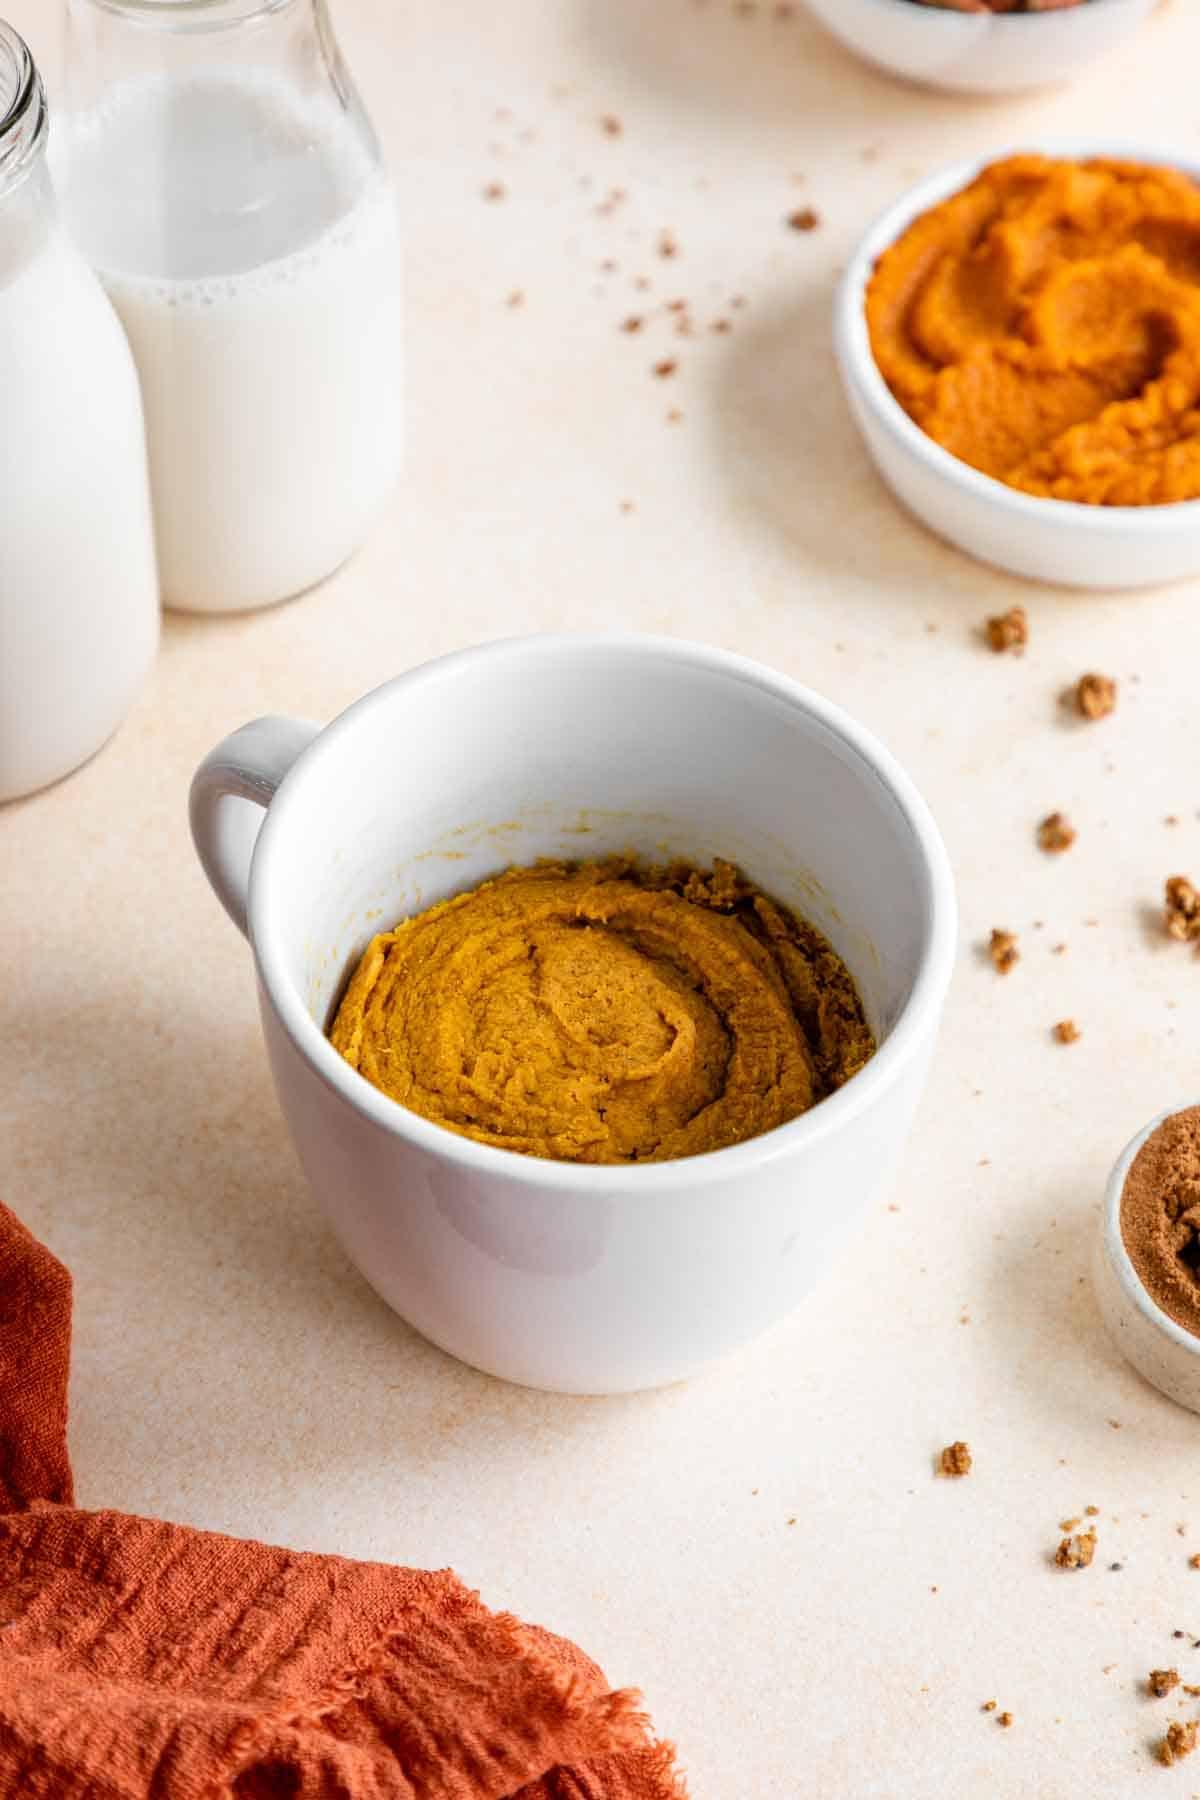 vegan gluten-free pumpkin mug cake inside a white mug